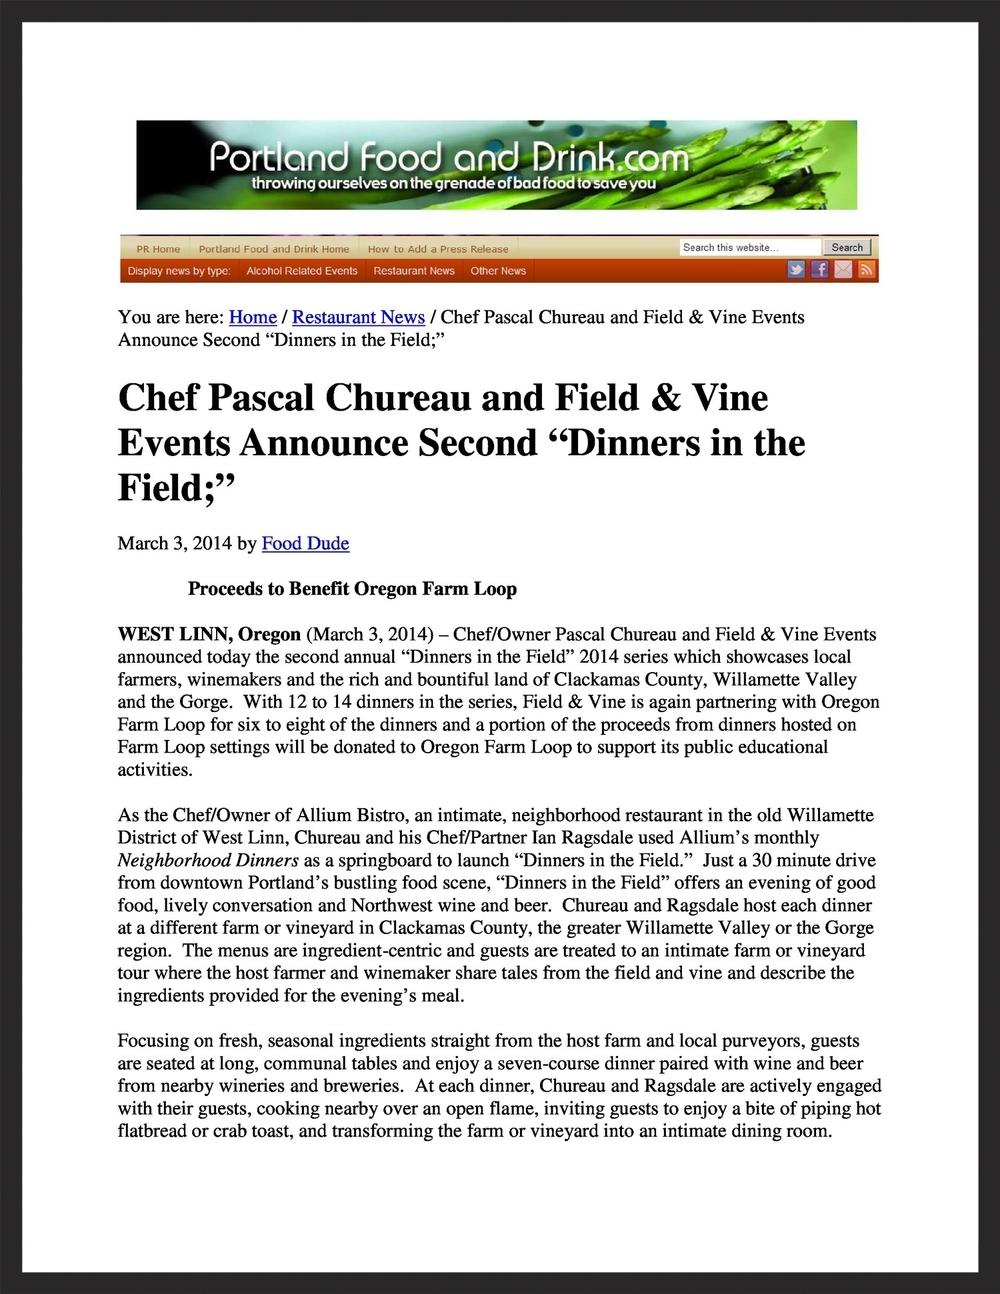 FIELD & VINE  PortlandFoodandDrink.com  03.03.2014